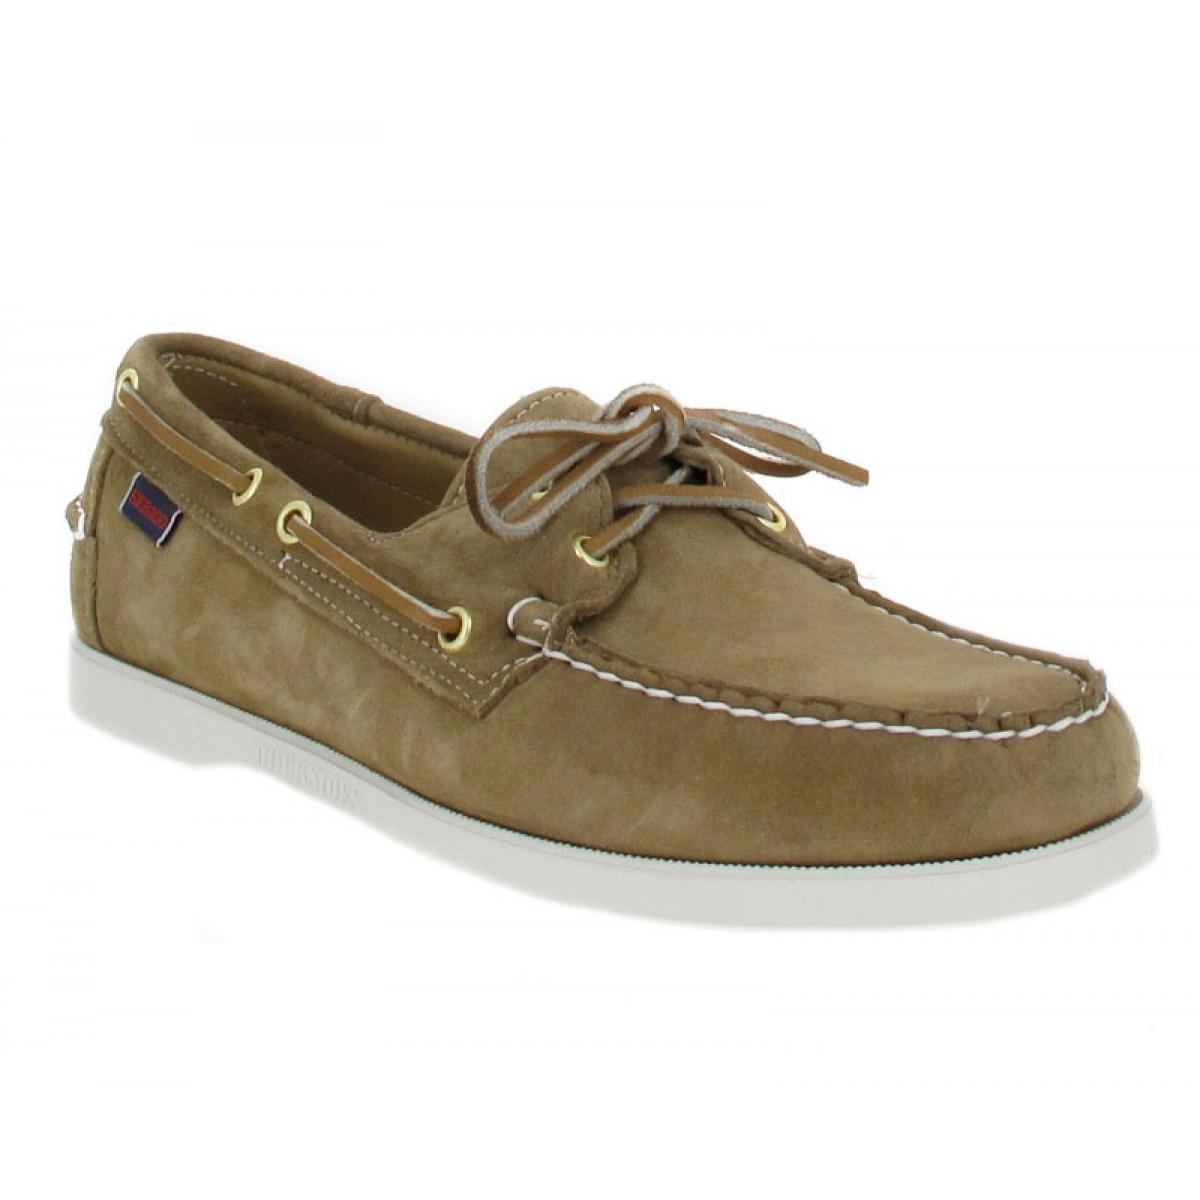 Chaussures bateaux SEBAGO Docksides velours Homme Beige